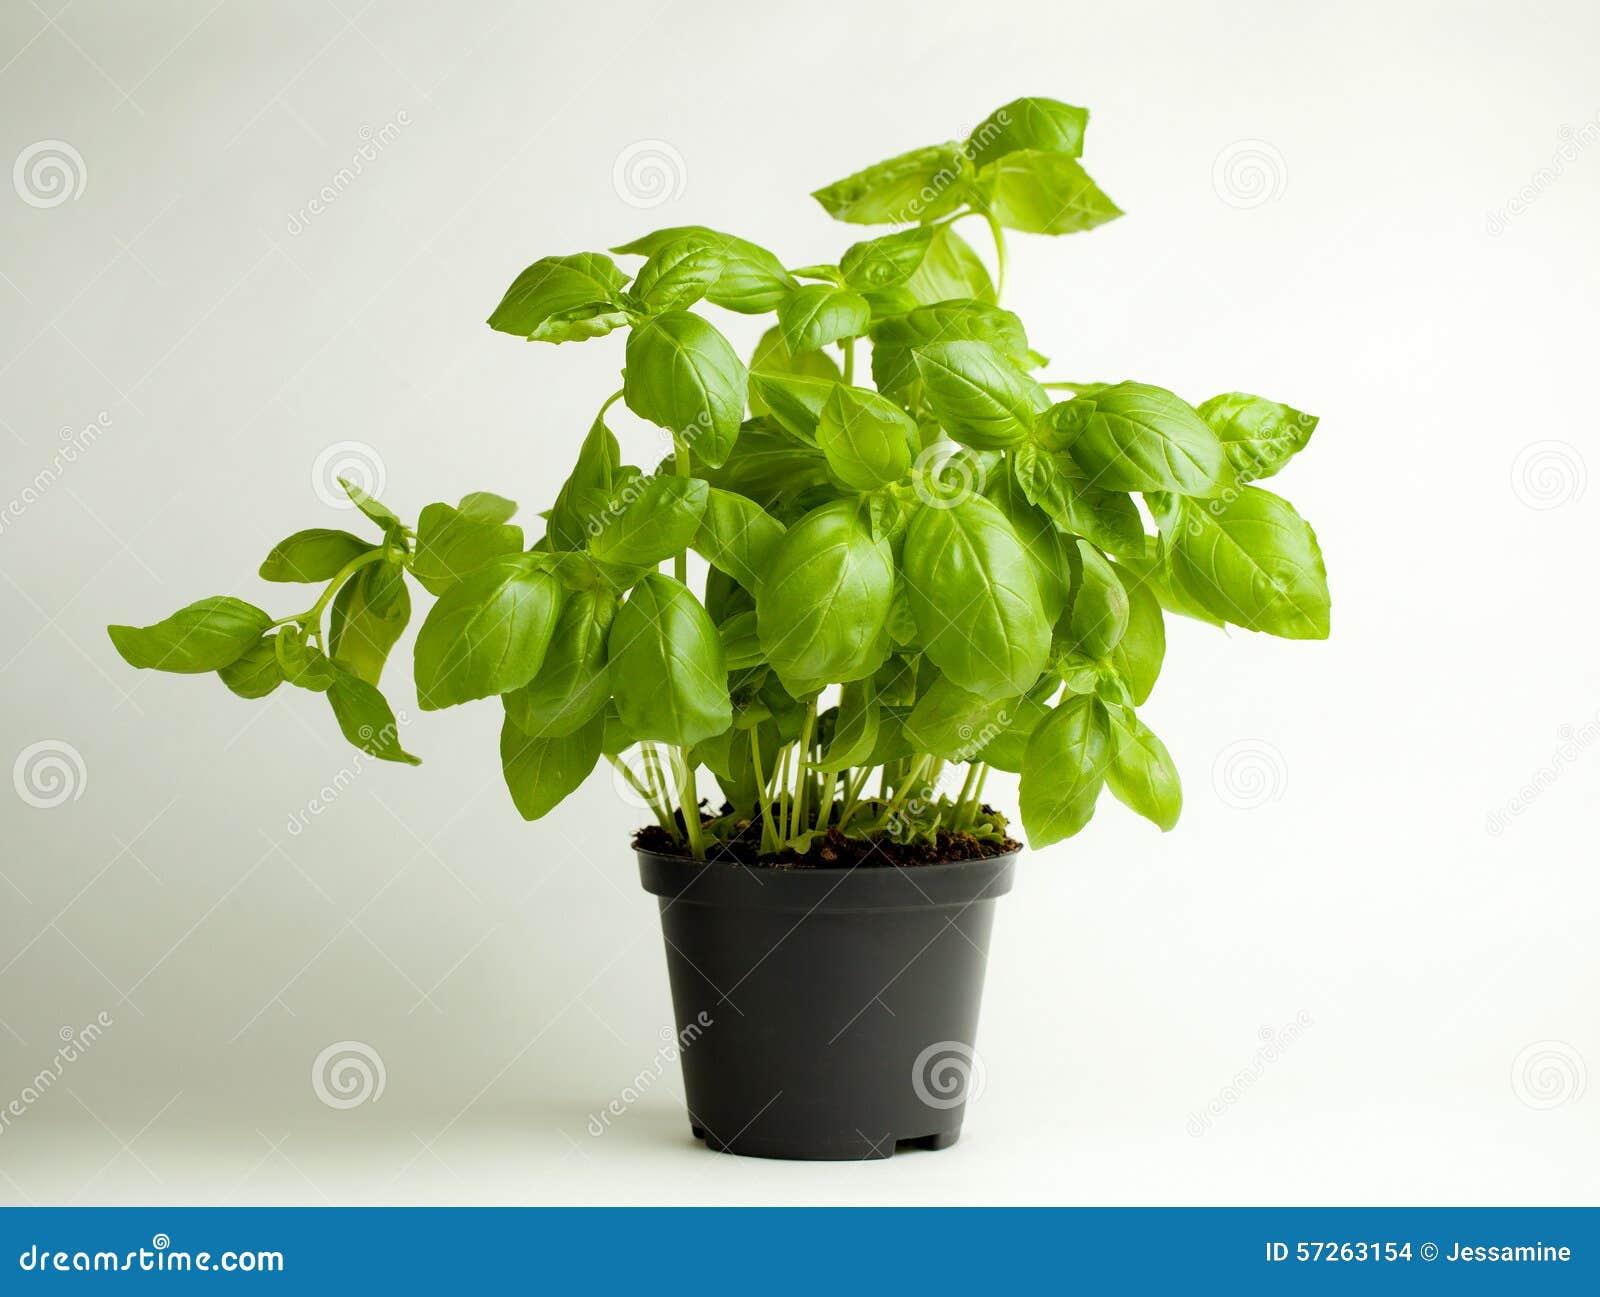 basil plant in a pot royalty free stock image 92483002. Black Bedroom Furniture Sets. Home Design Ideas